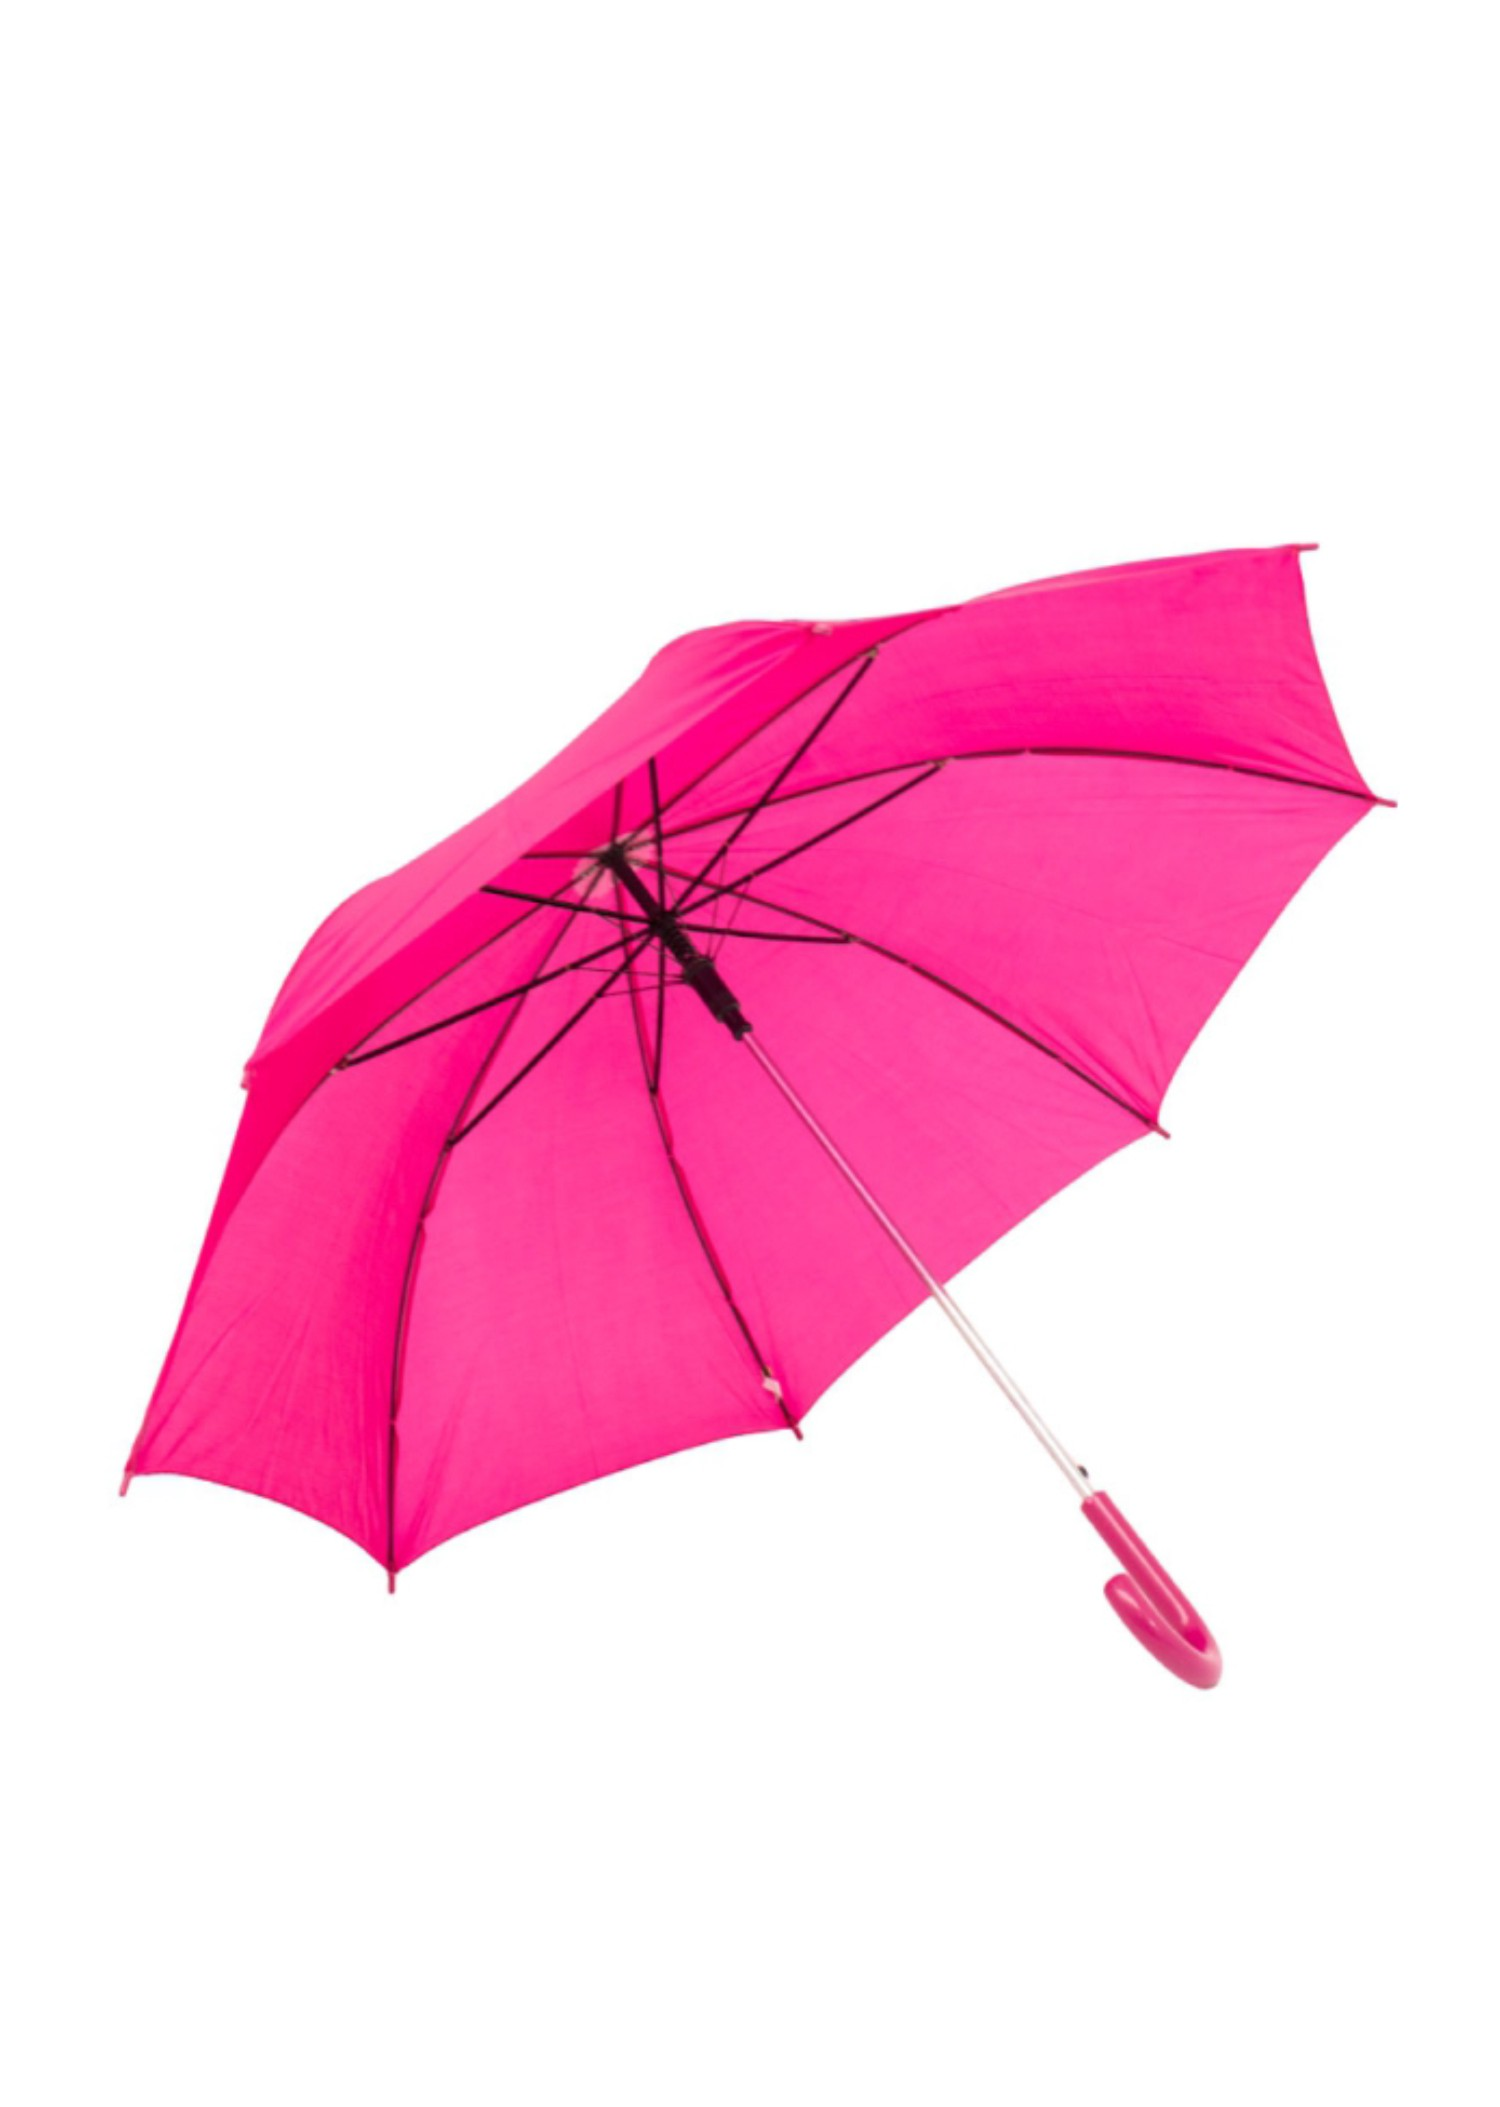 Cómo proteger el pelo de la lluvia